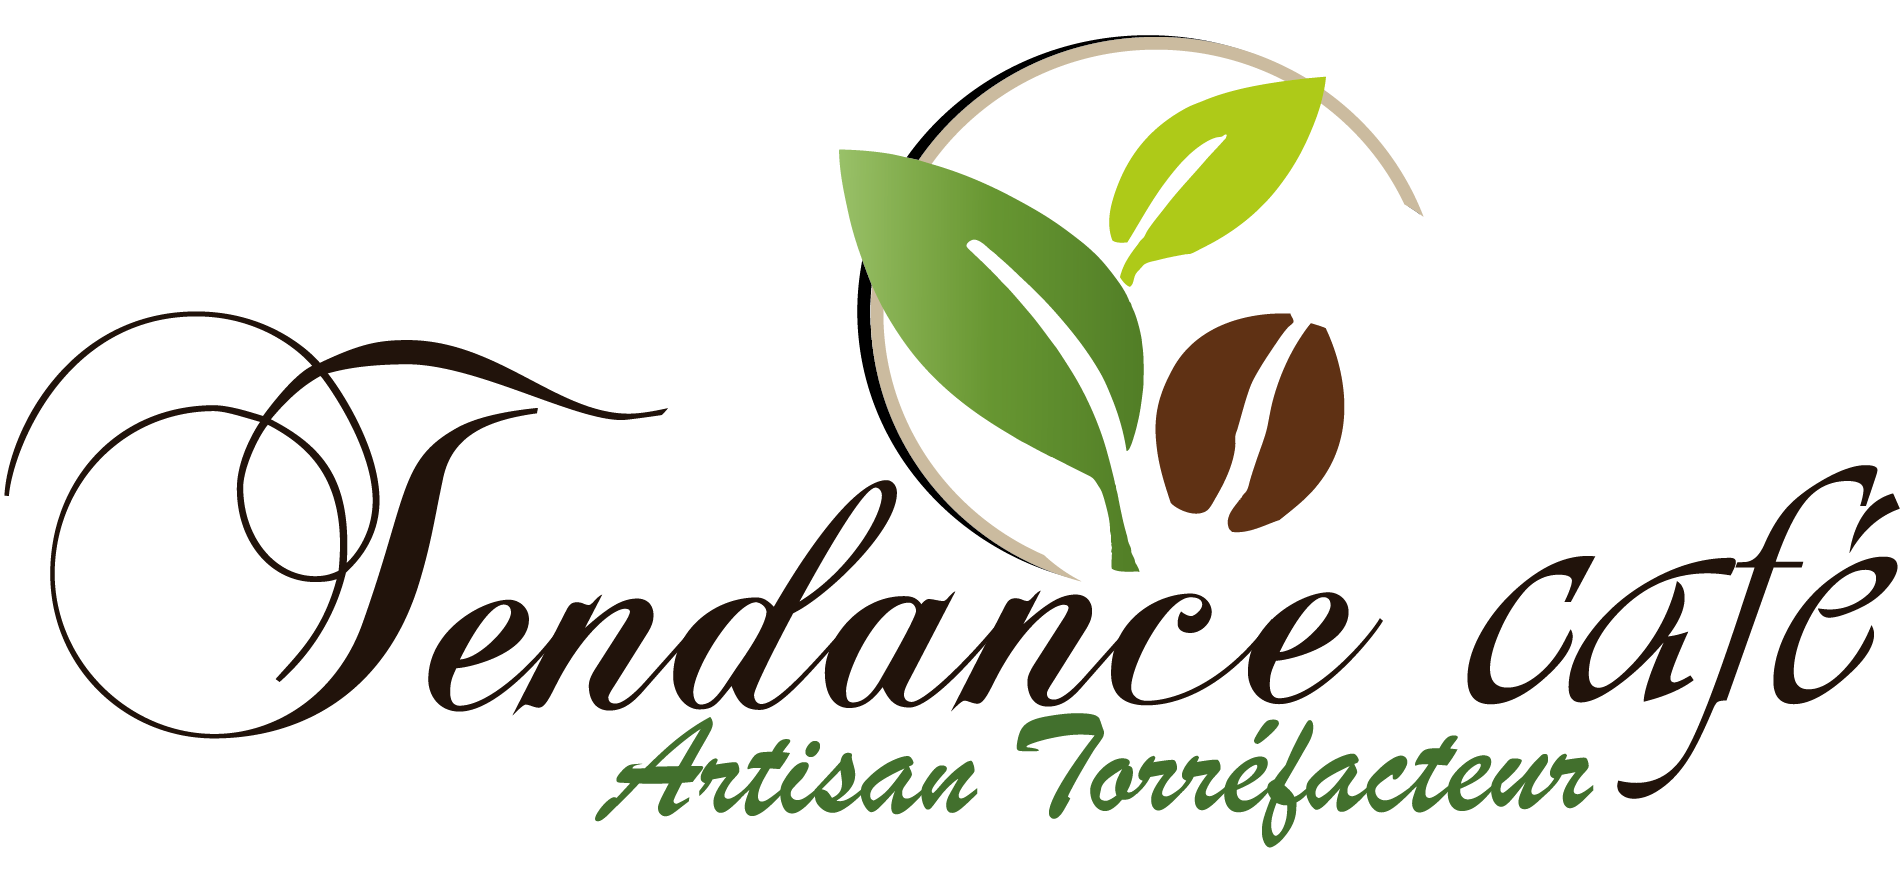 Tendance Café